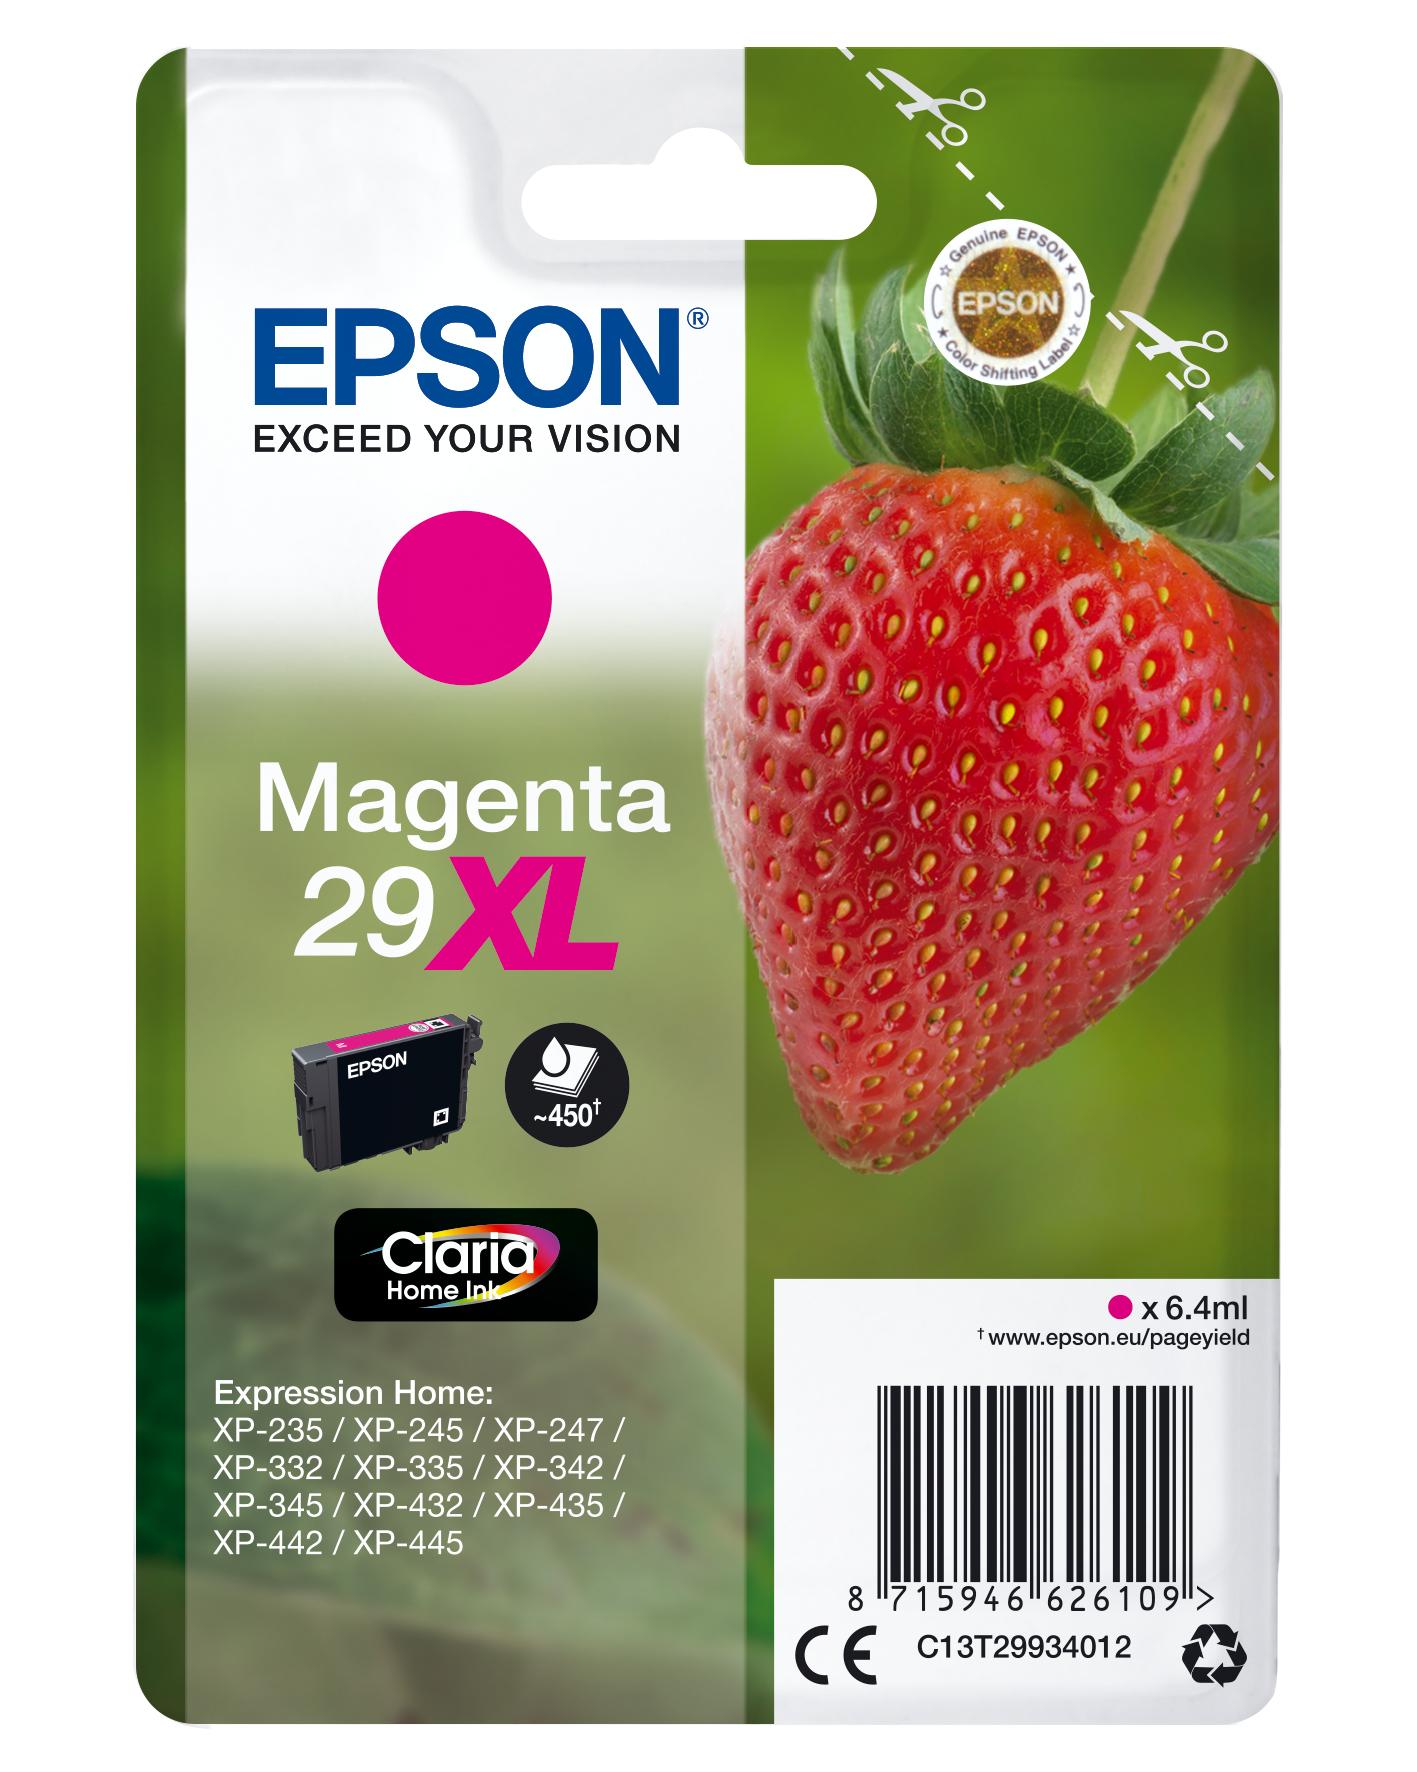 Epson Strawberry Singlepack Magenta 29XL Claria Home Ink